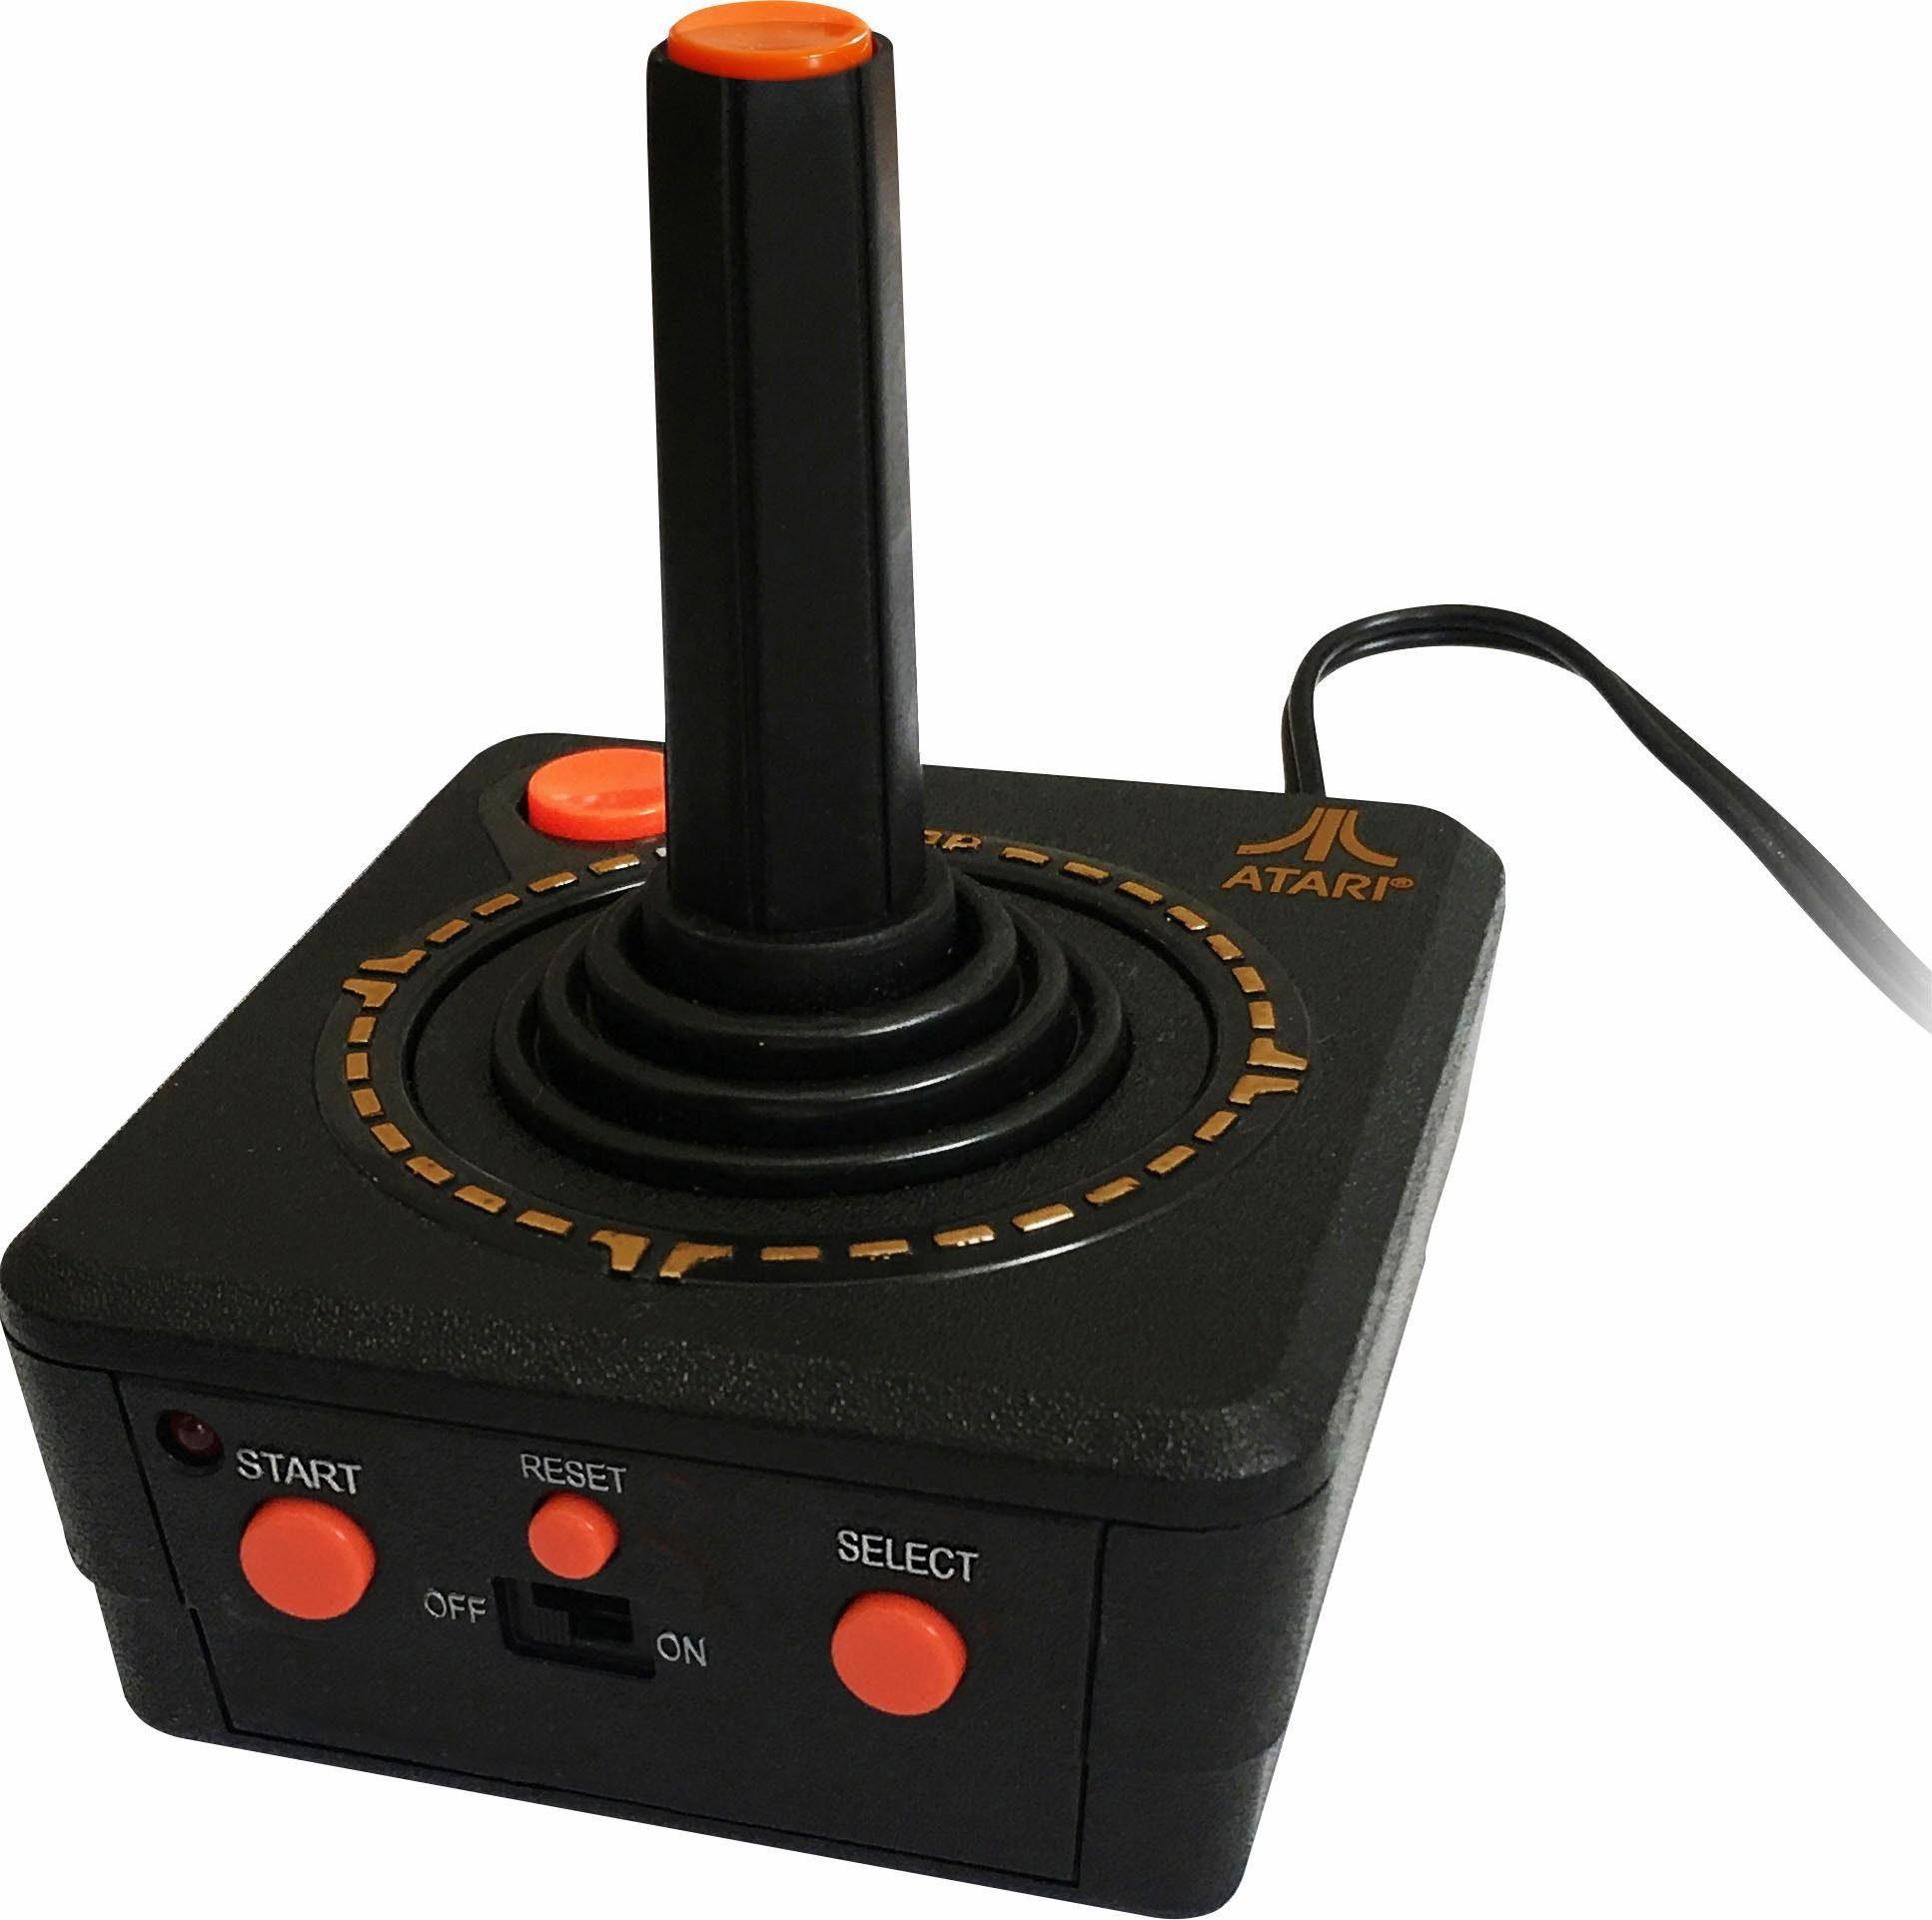 ATARI Retro Plug & Play TV Joystick Controller